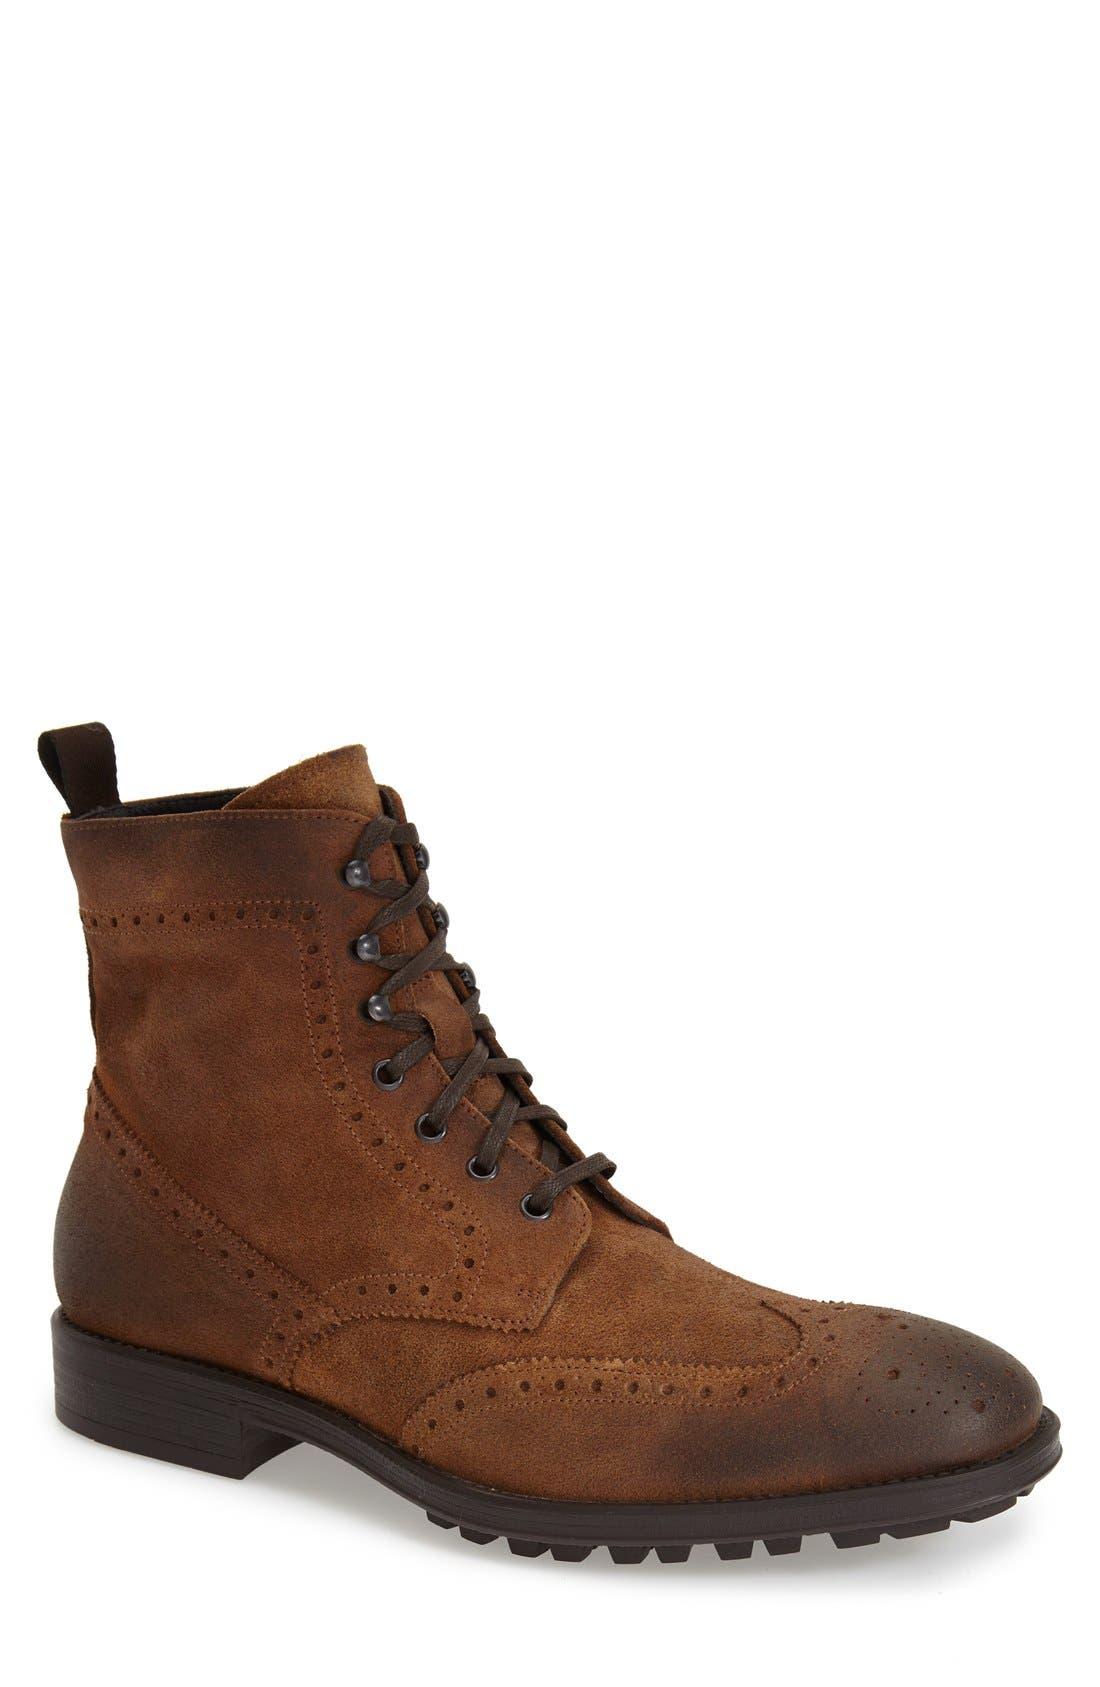 TO BOOT NEW YORK 'Braeden Mid' Wingtip Boot, Main, color, 231